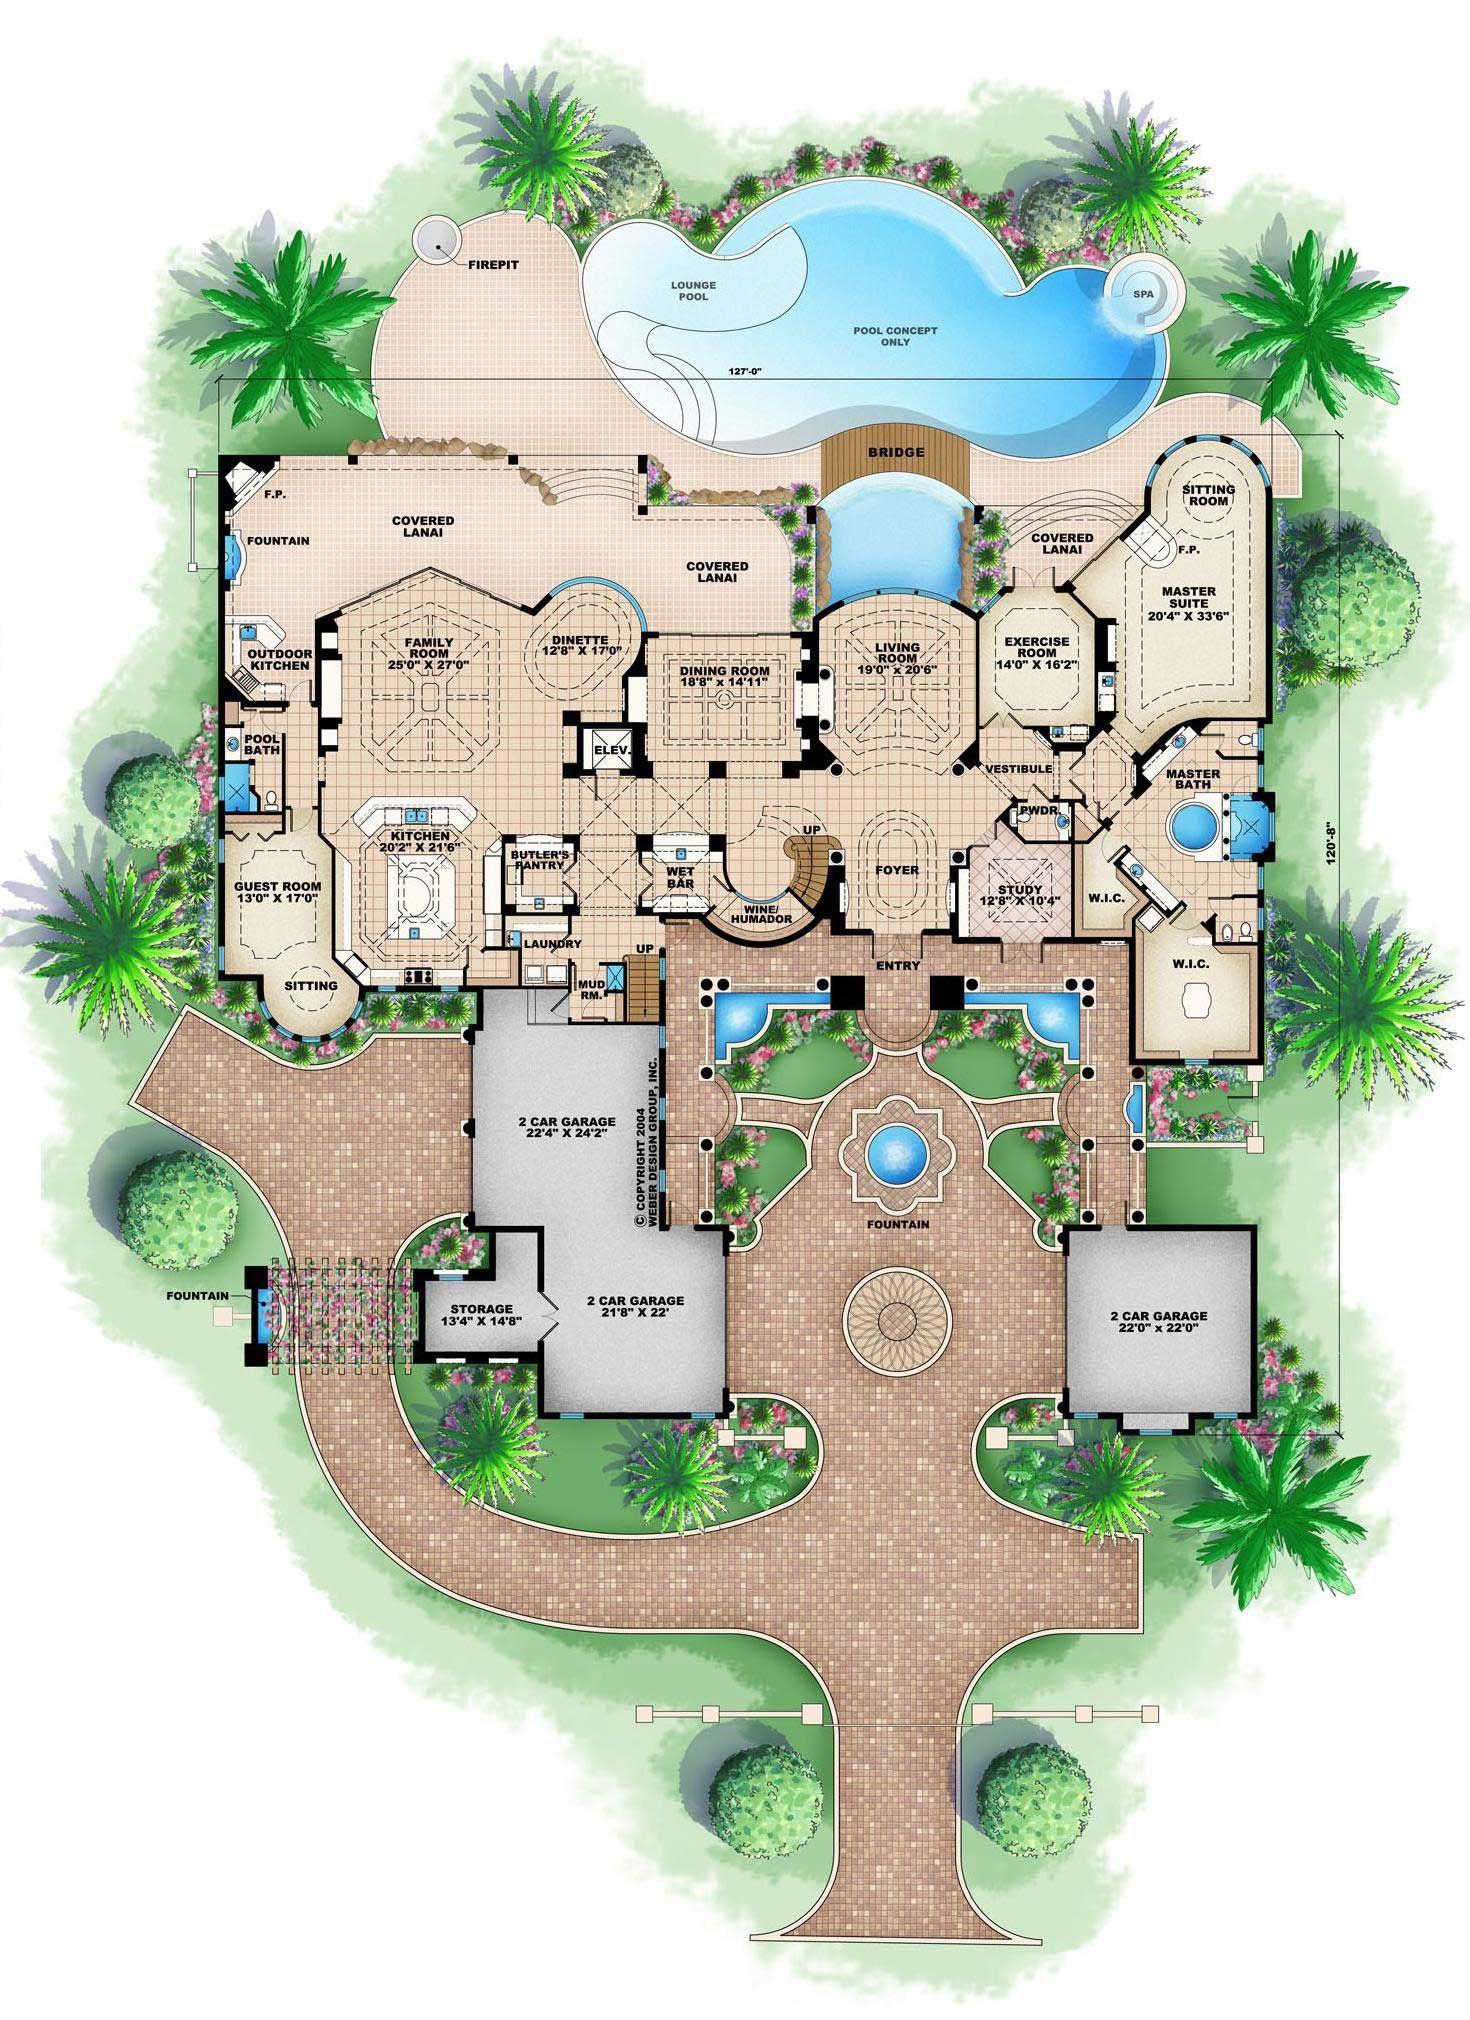 Luxury Mediterranean Home Plans Home Design Palacio Mediterranean House Plans Luxury House Plans House Floor Plans